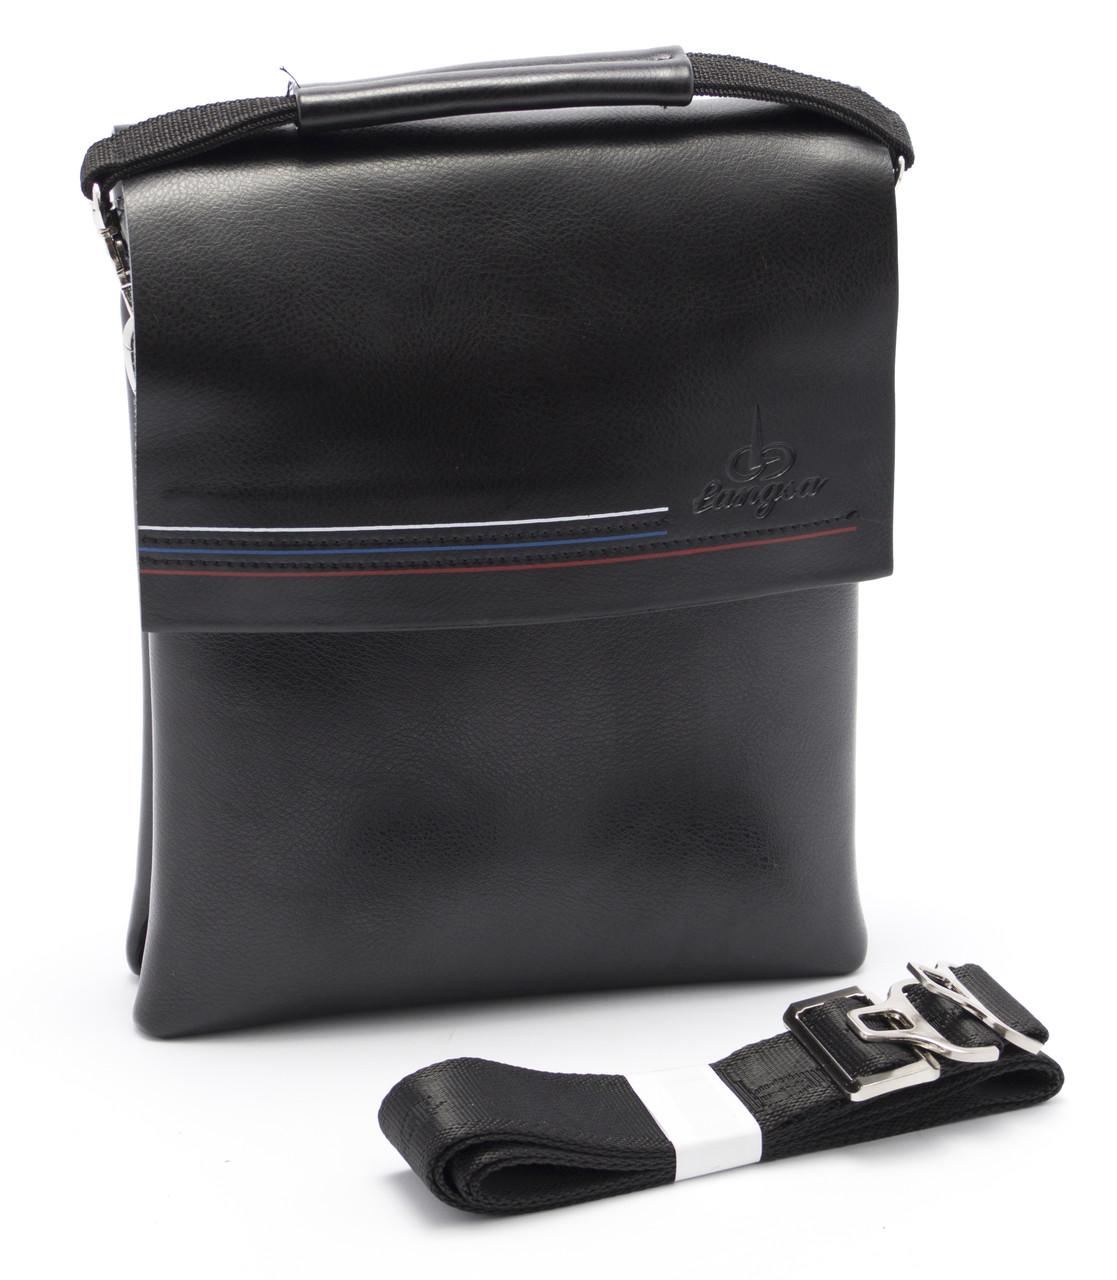 Аккуратная мужская черная сумка LANGSA art. 9955-3